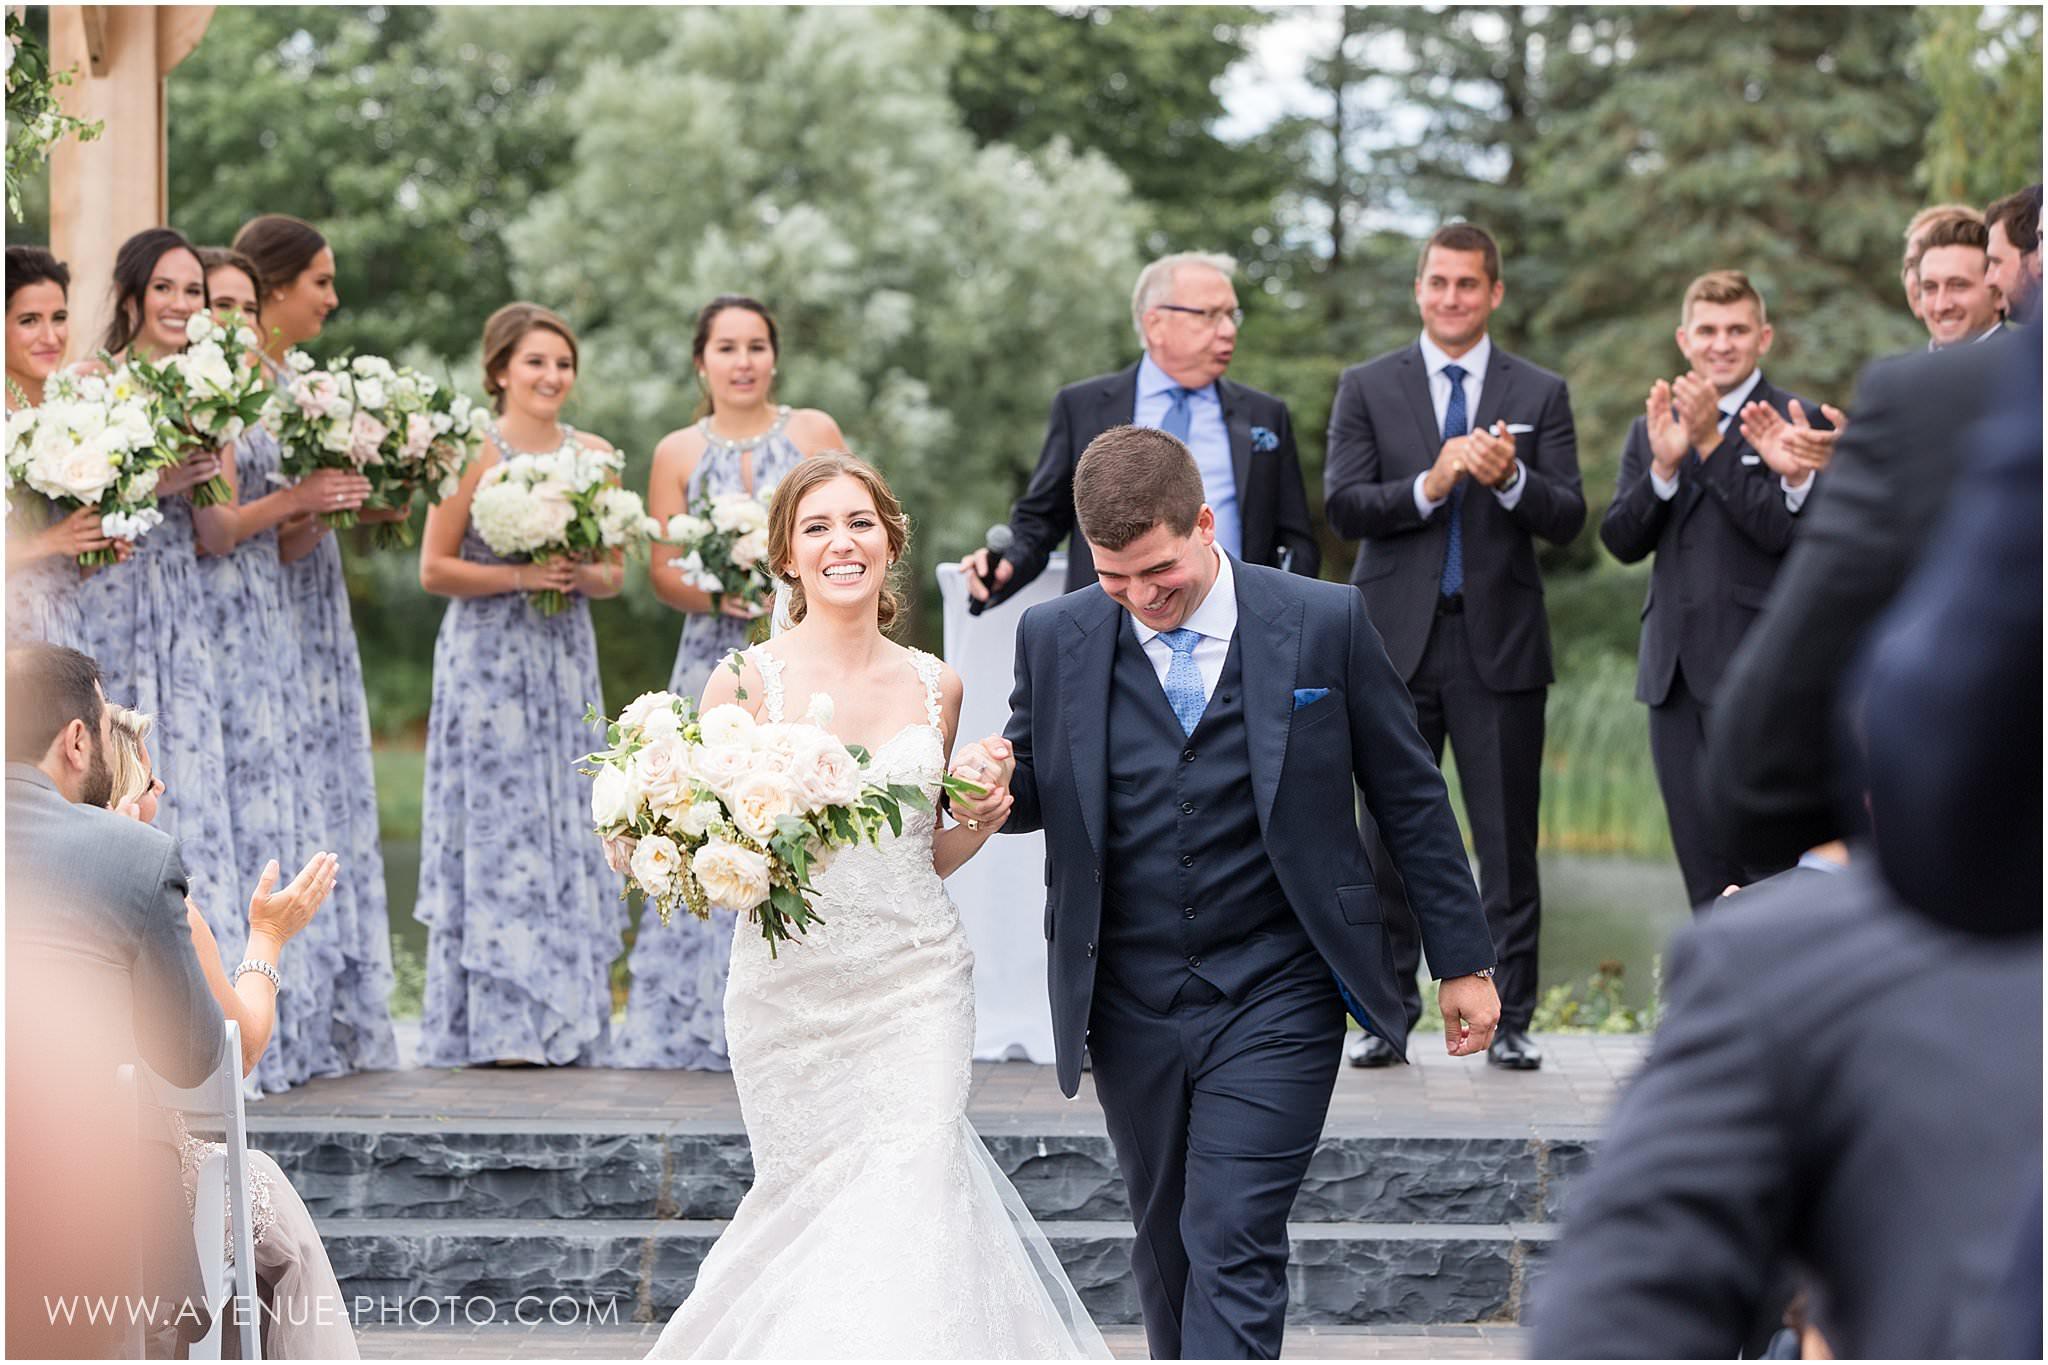 The Arlington Estate Wedding Photos - Kleinburg Wedding Photography, Luxury Wedding Outdoor Ceremony